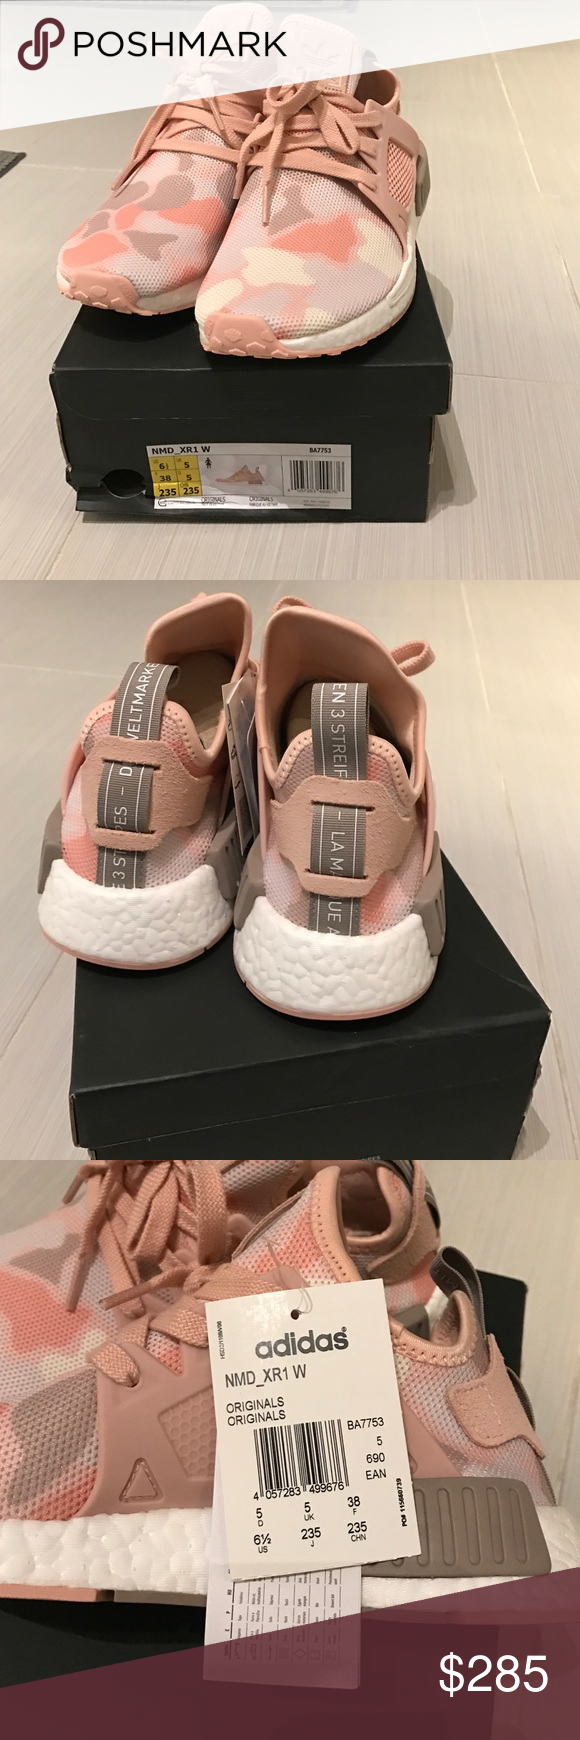 adidas nmd rt duck mimetico adidas nmd, nmd e scarpe sportive